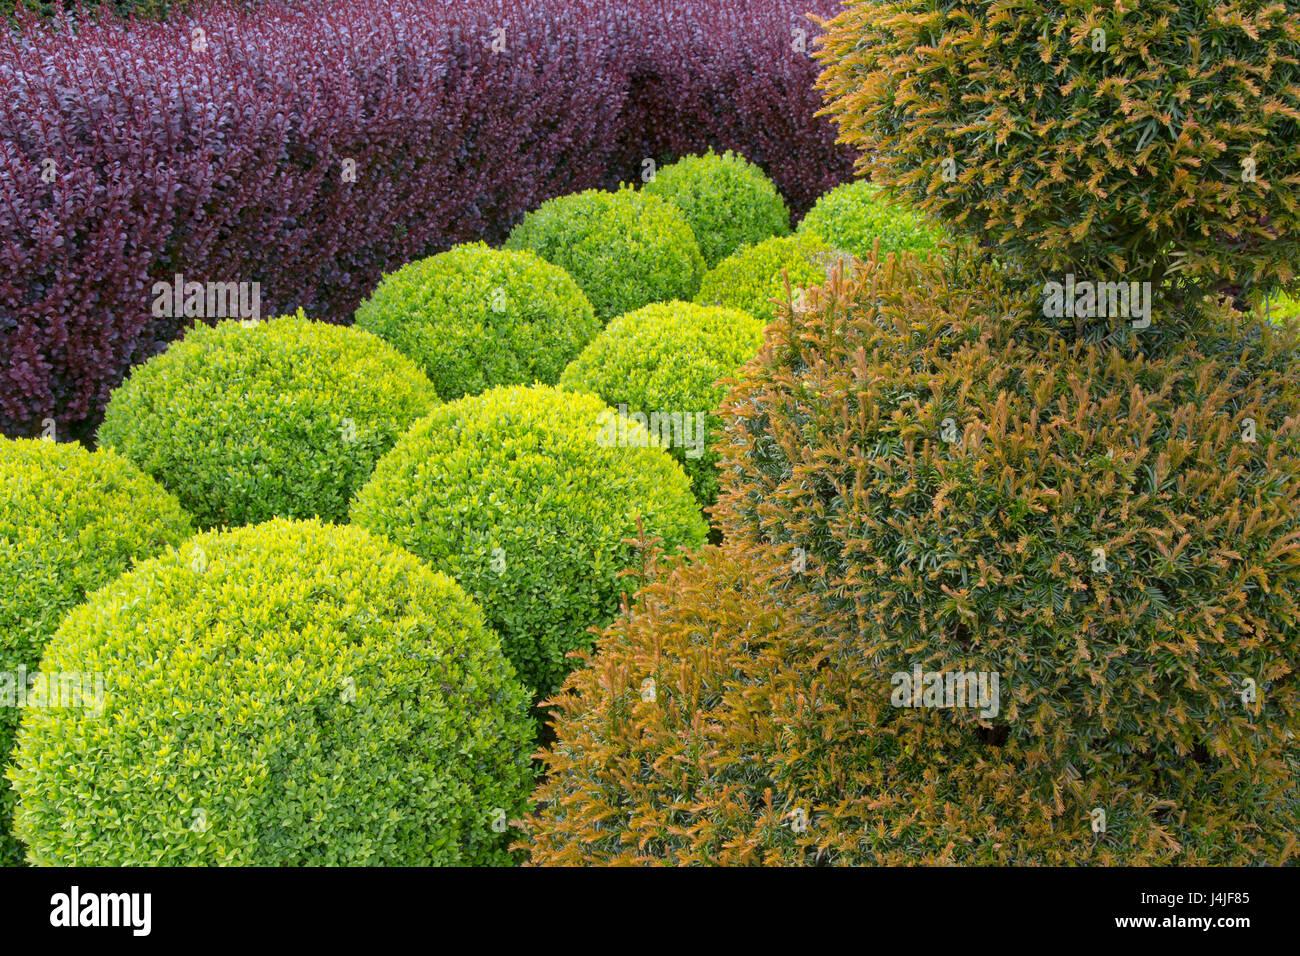 Box globes;yew; and purple Berberis hedging - Stock Image